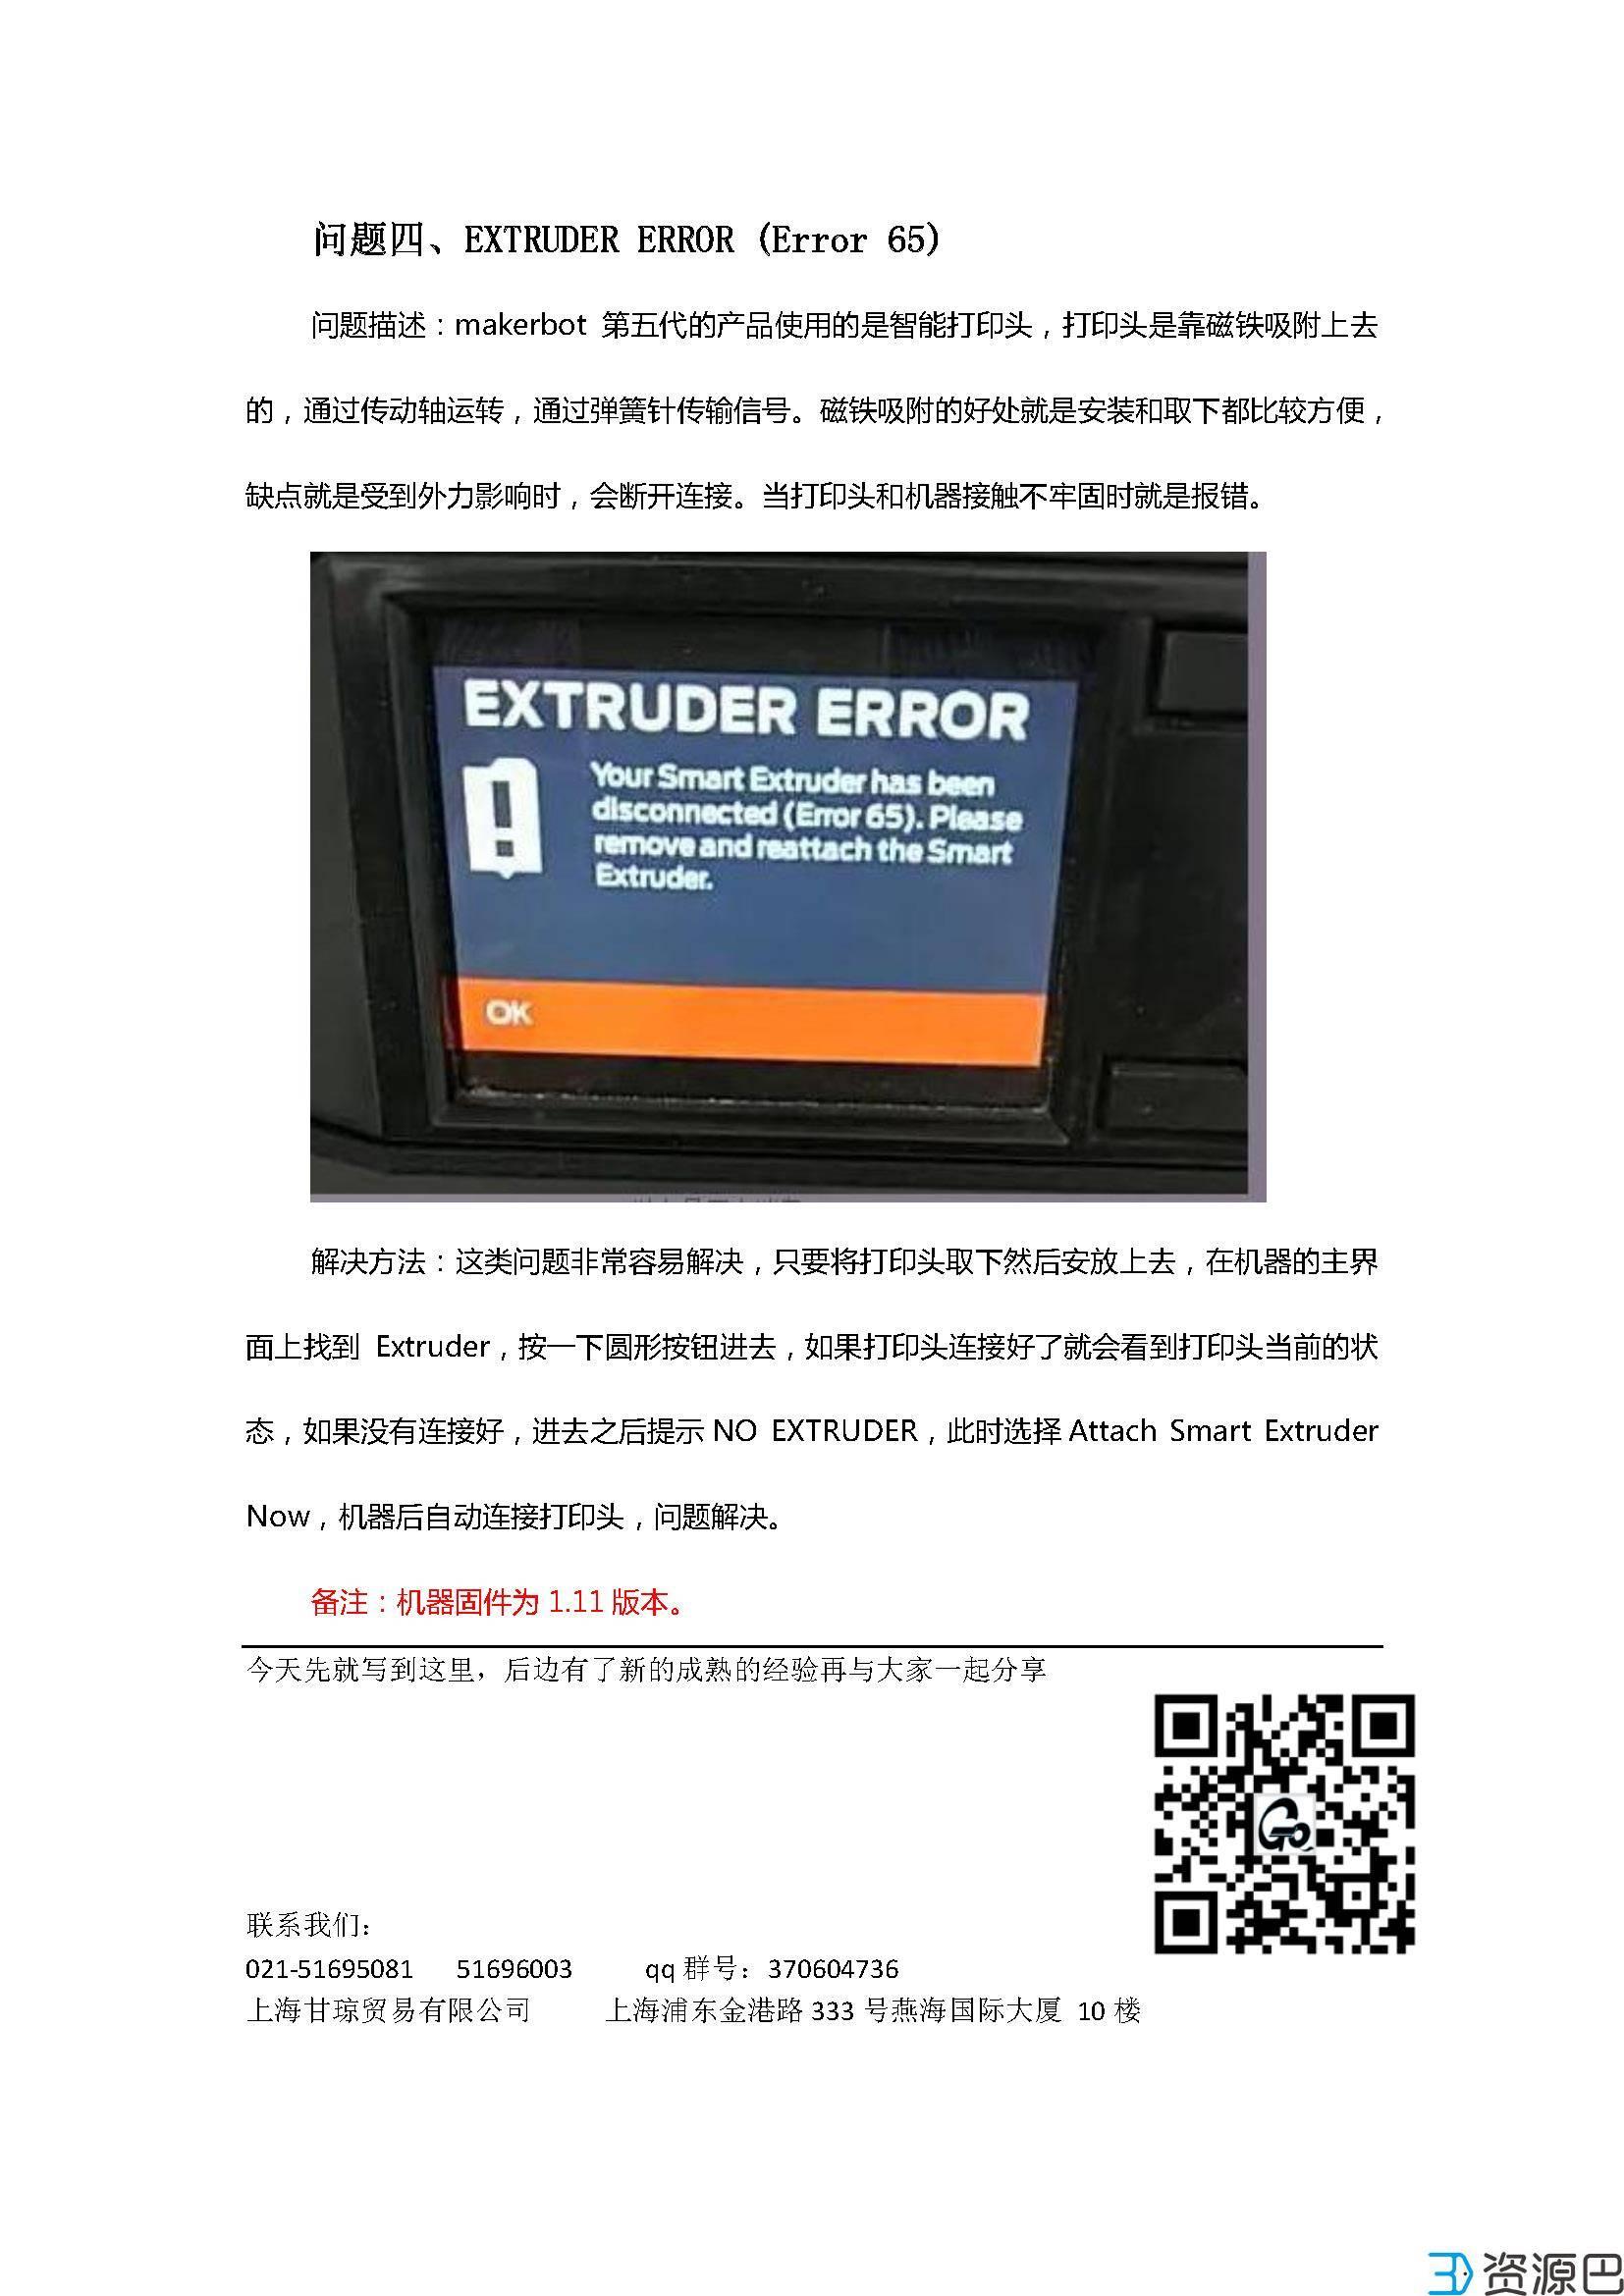 MakerBot Replicator 3d打印机 技术文档插图7